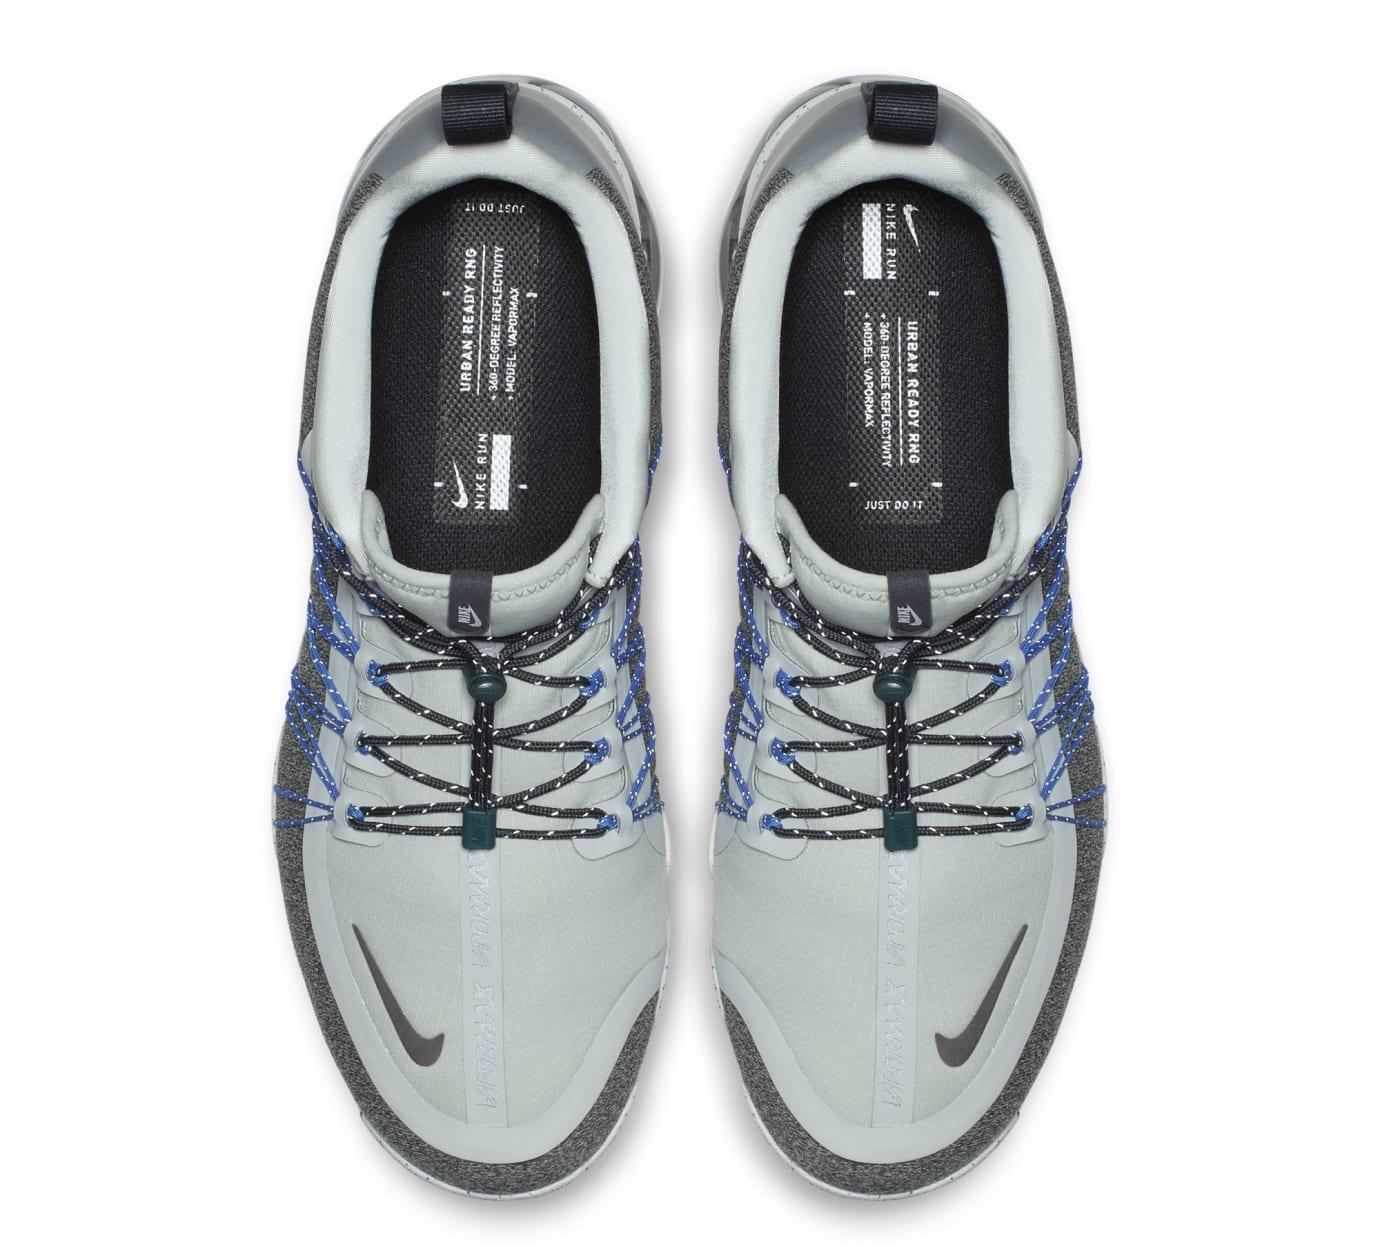 Nike Air VaporMax Run Utility 'Grey' (Top)